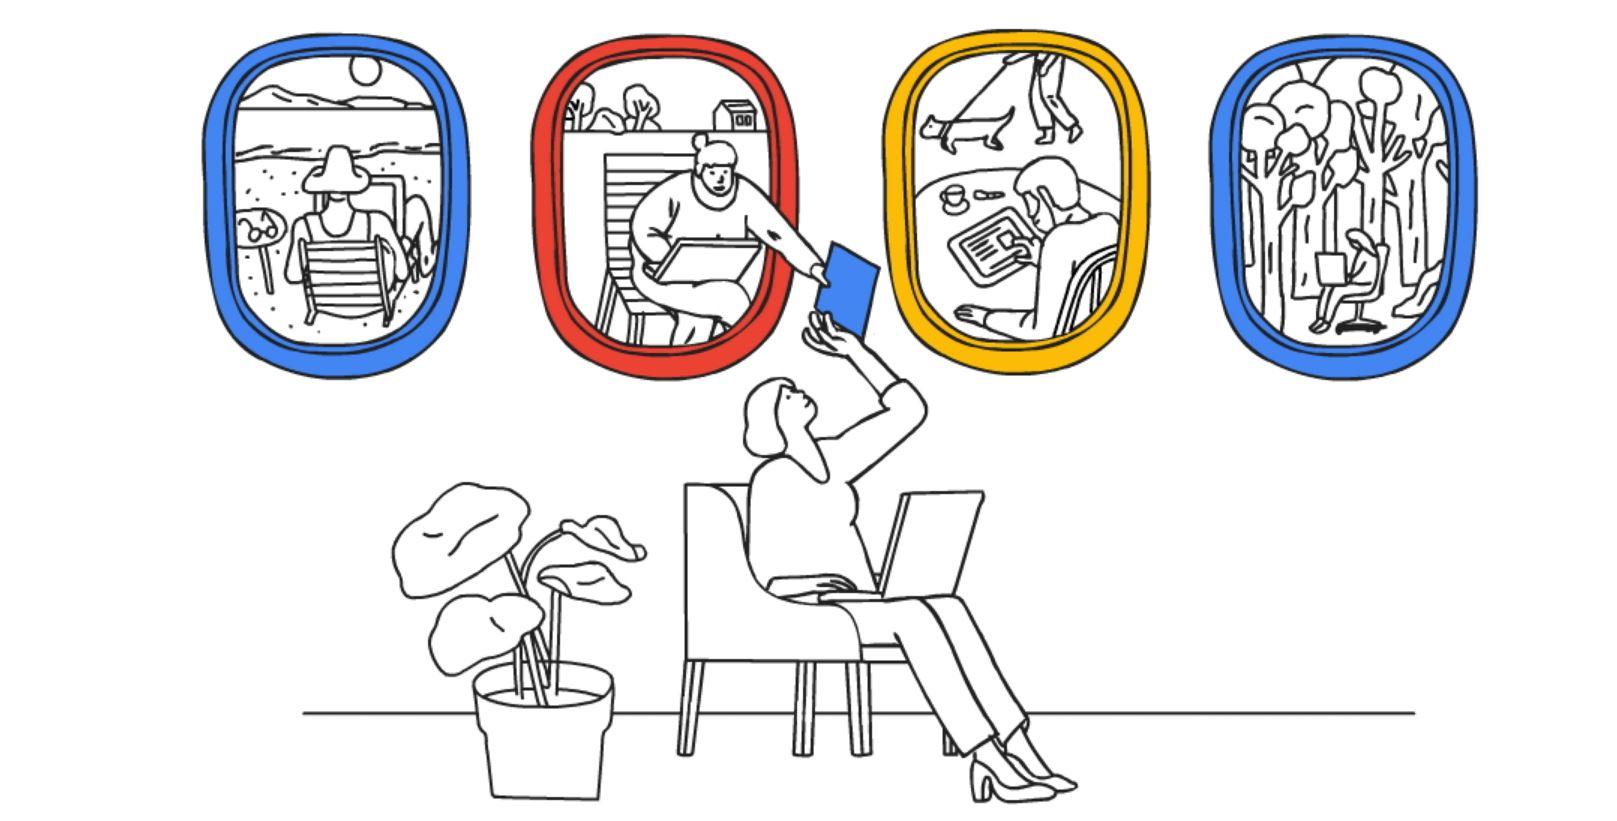 g-suite-google-apps-for-work-actualizado